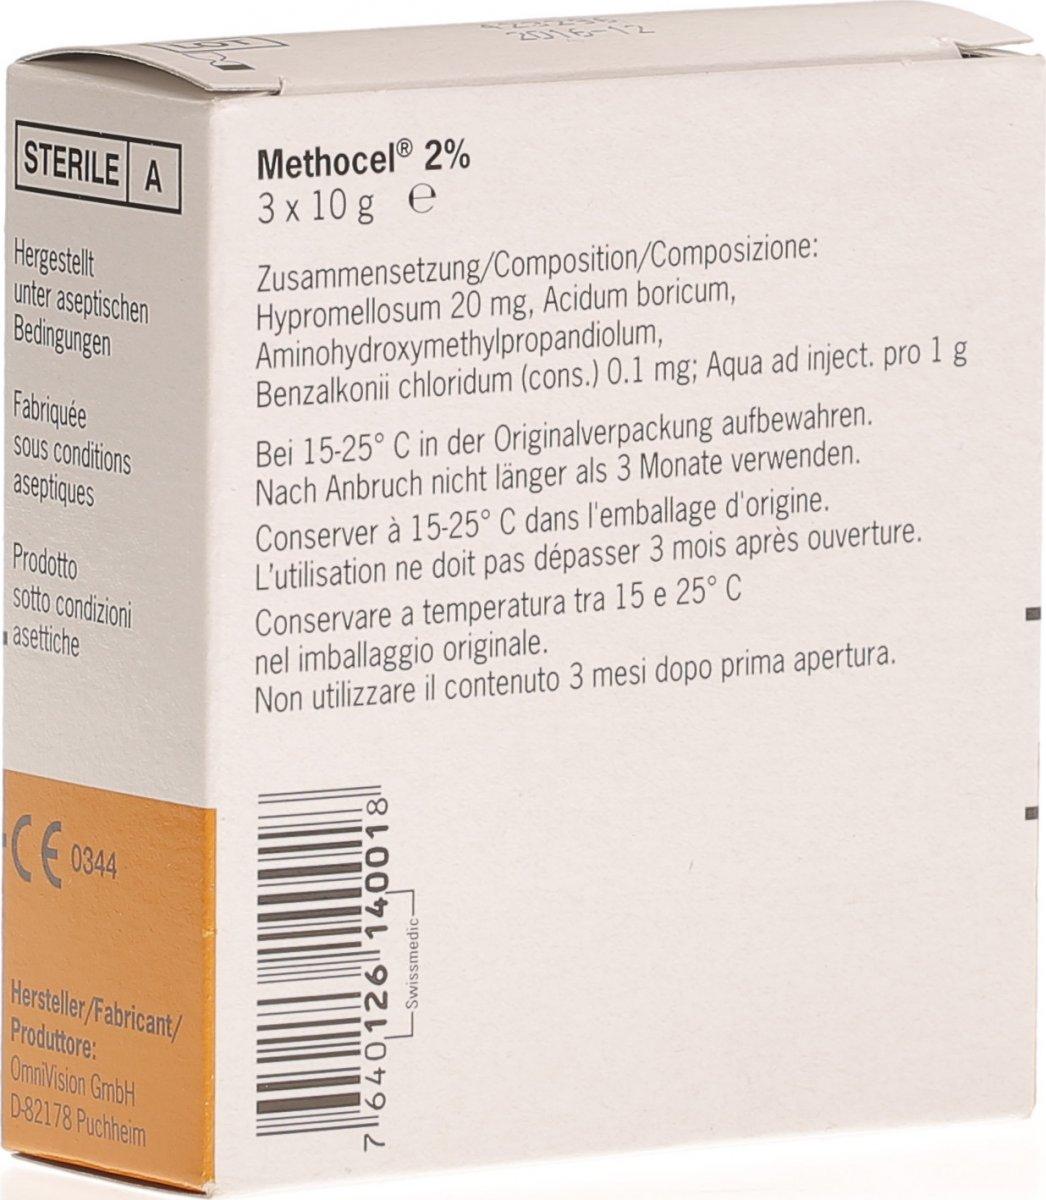 Methocel brand label